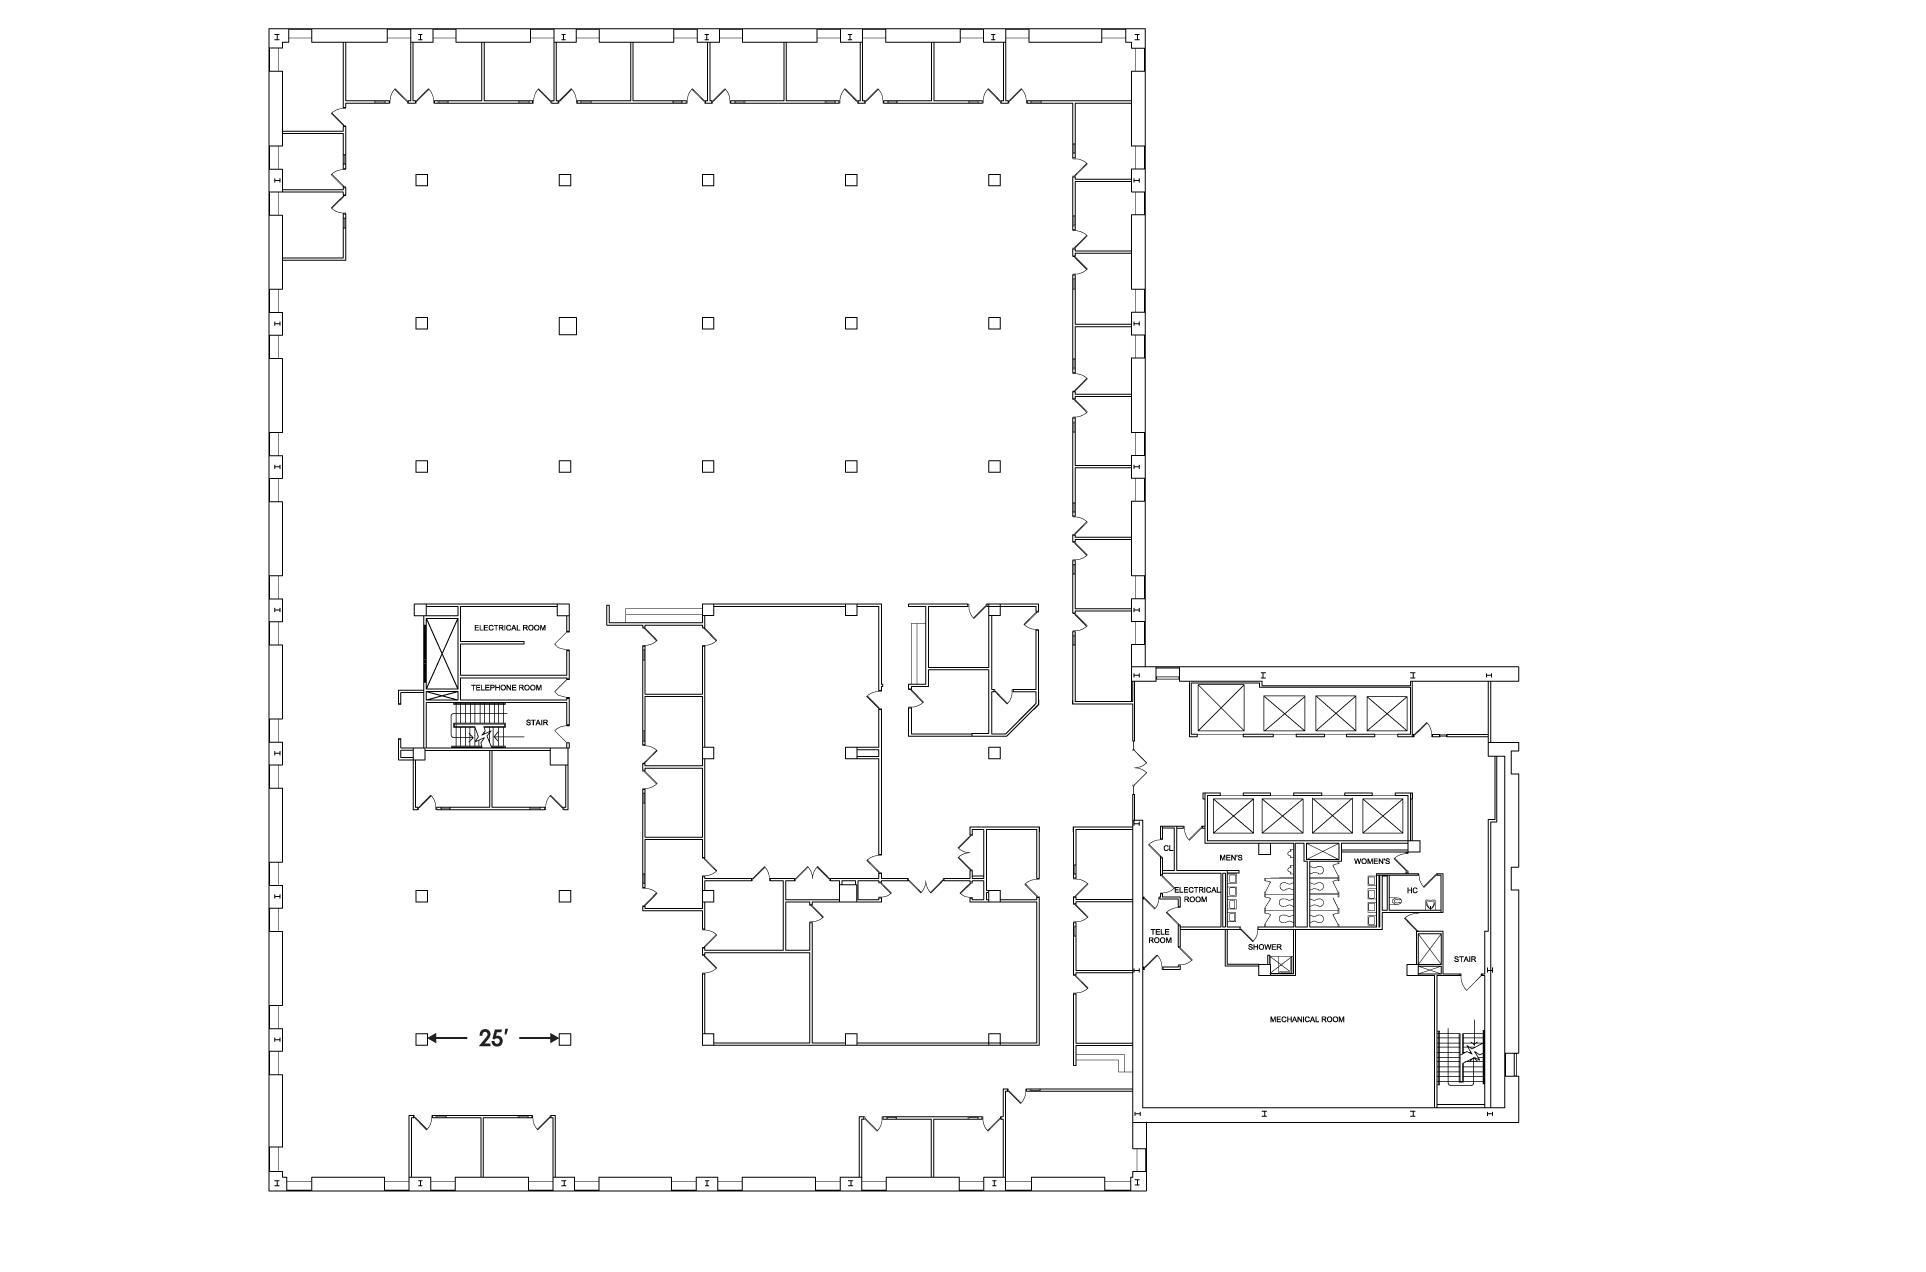 Tower 3 Floor 9 Floorplan Image